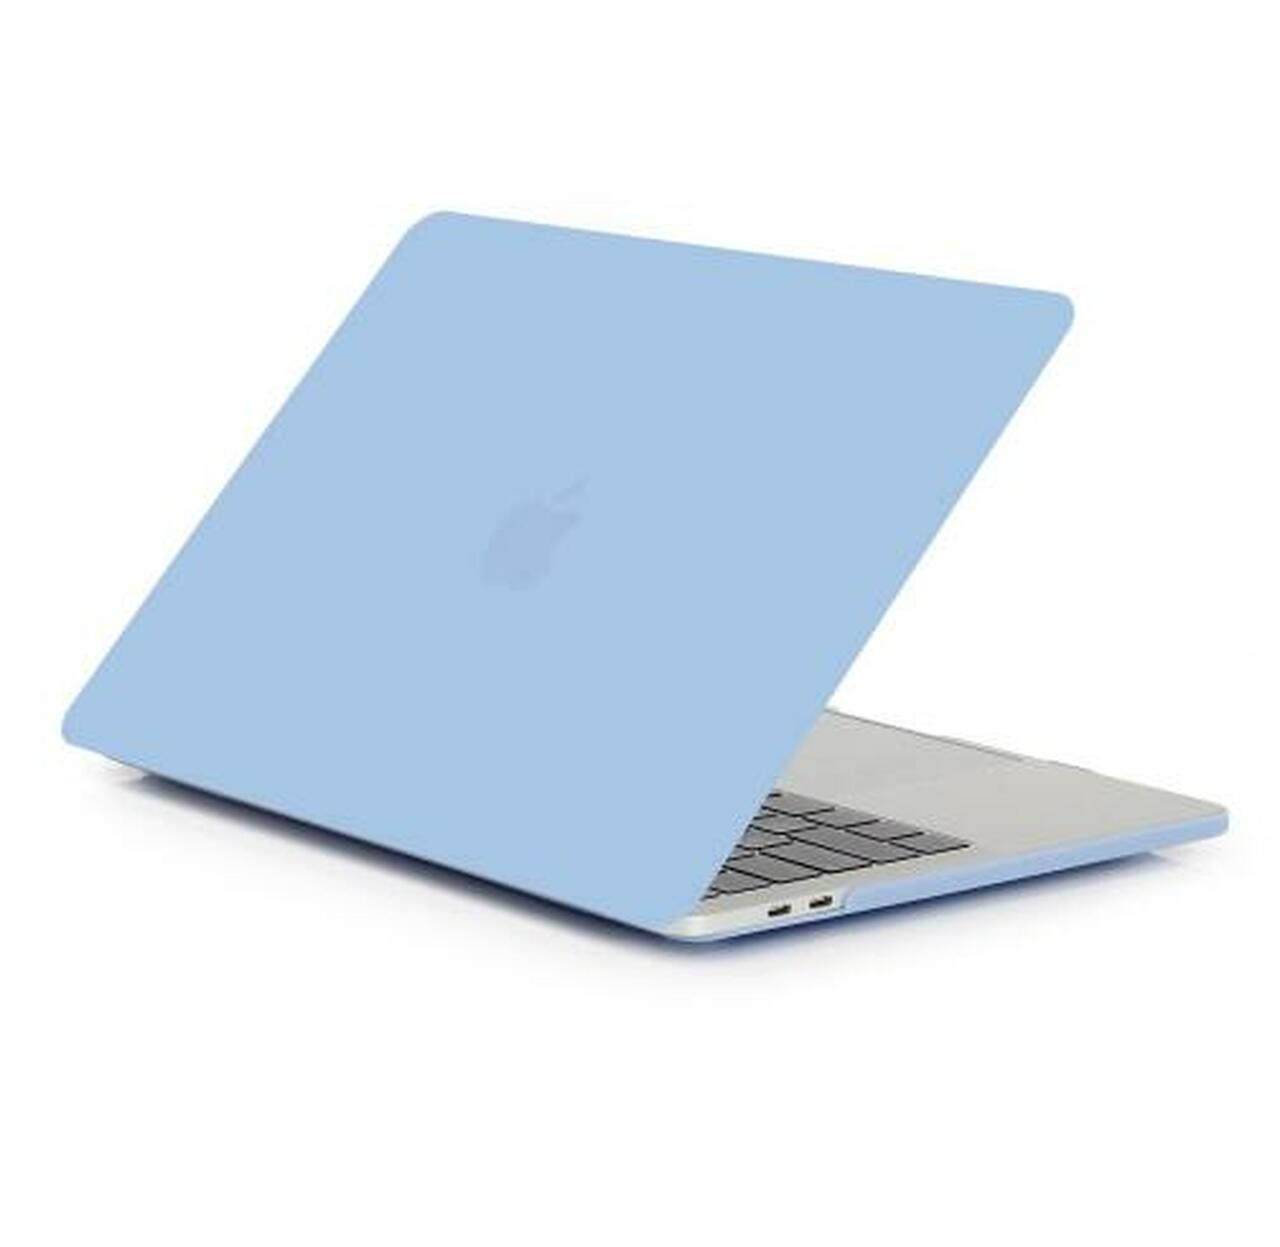 Laptop Hard Cover Retina Case for Apple Macbook Mac Book Air Pro 11 12 13 15inch